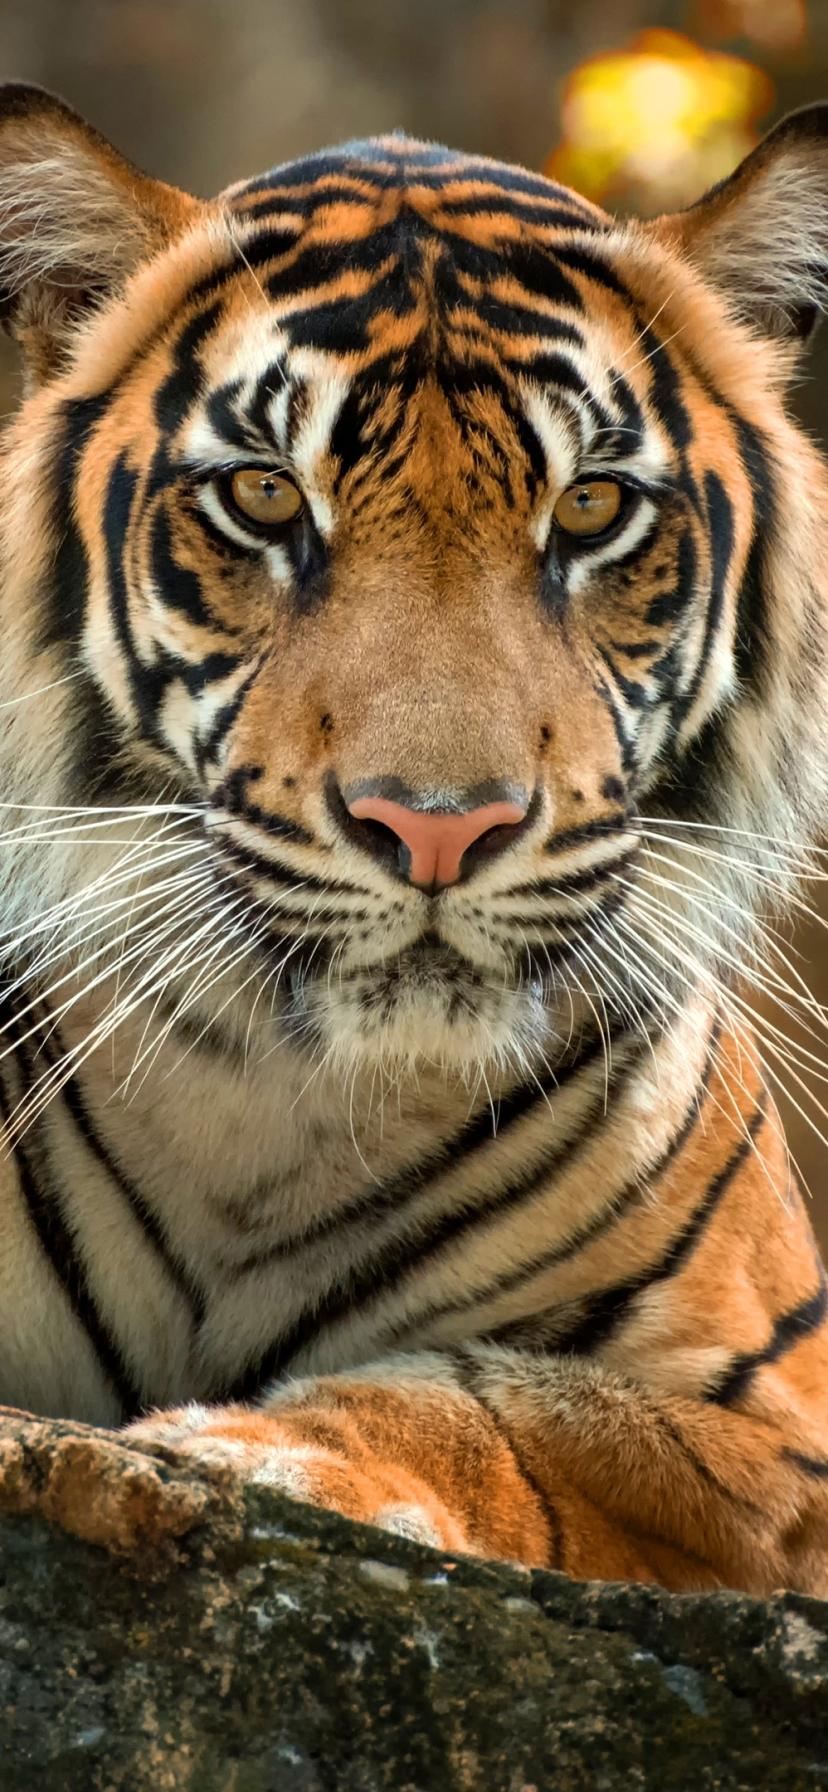 Tiger Roar Face Ultra Desktop Backgrounds Wallpapers For 4k Uhd Tv Tablet Smartphone Hd